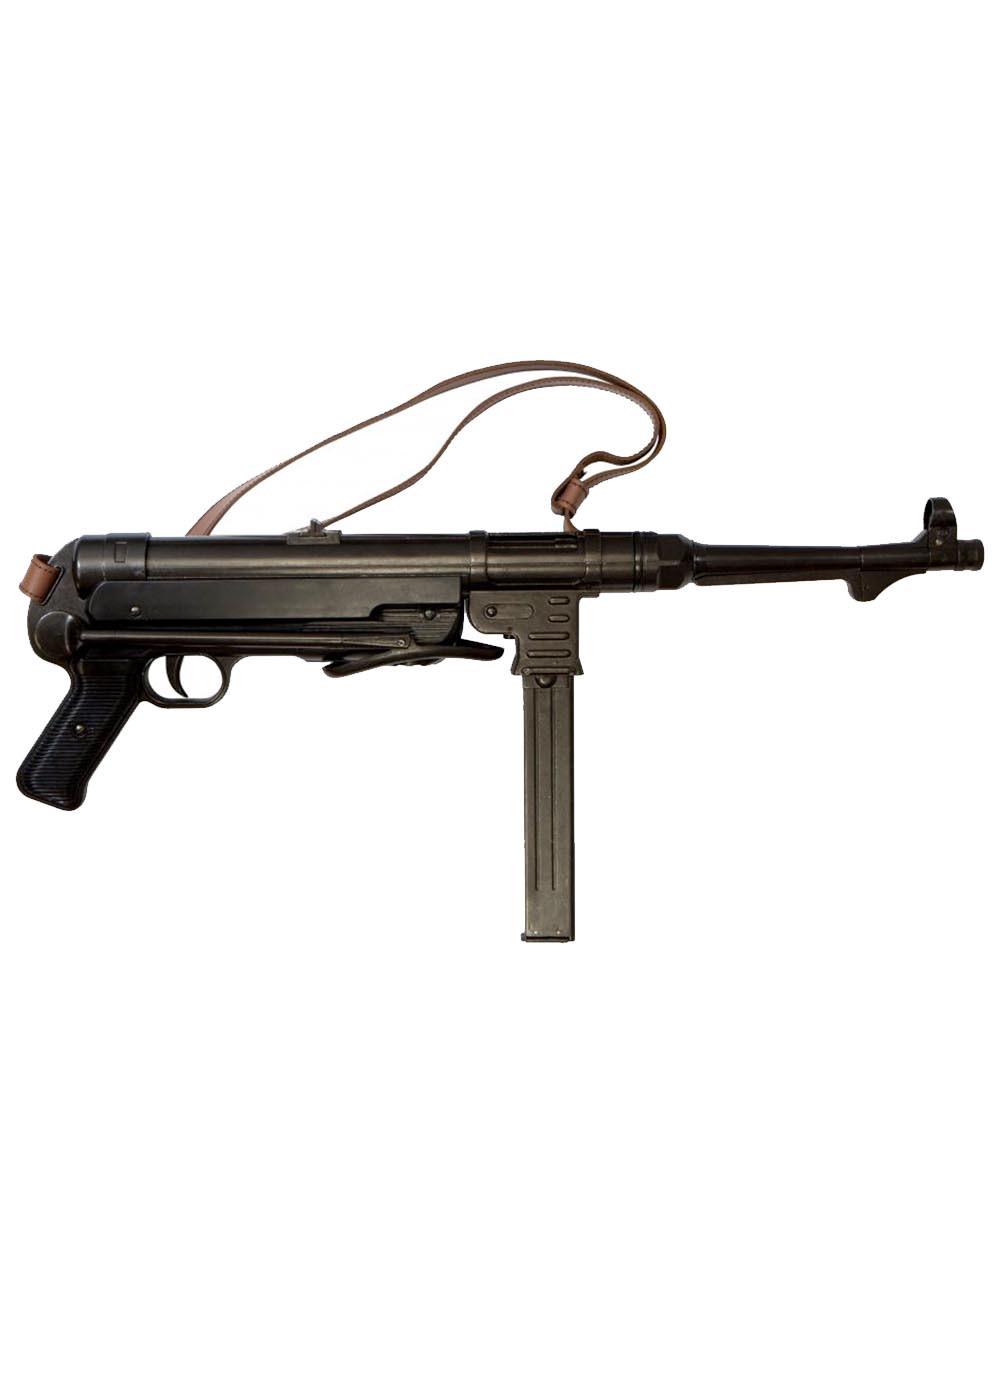 Автомат МР40, Германия 1940 г.